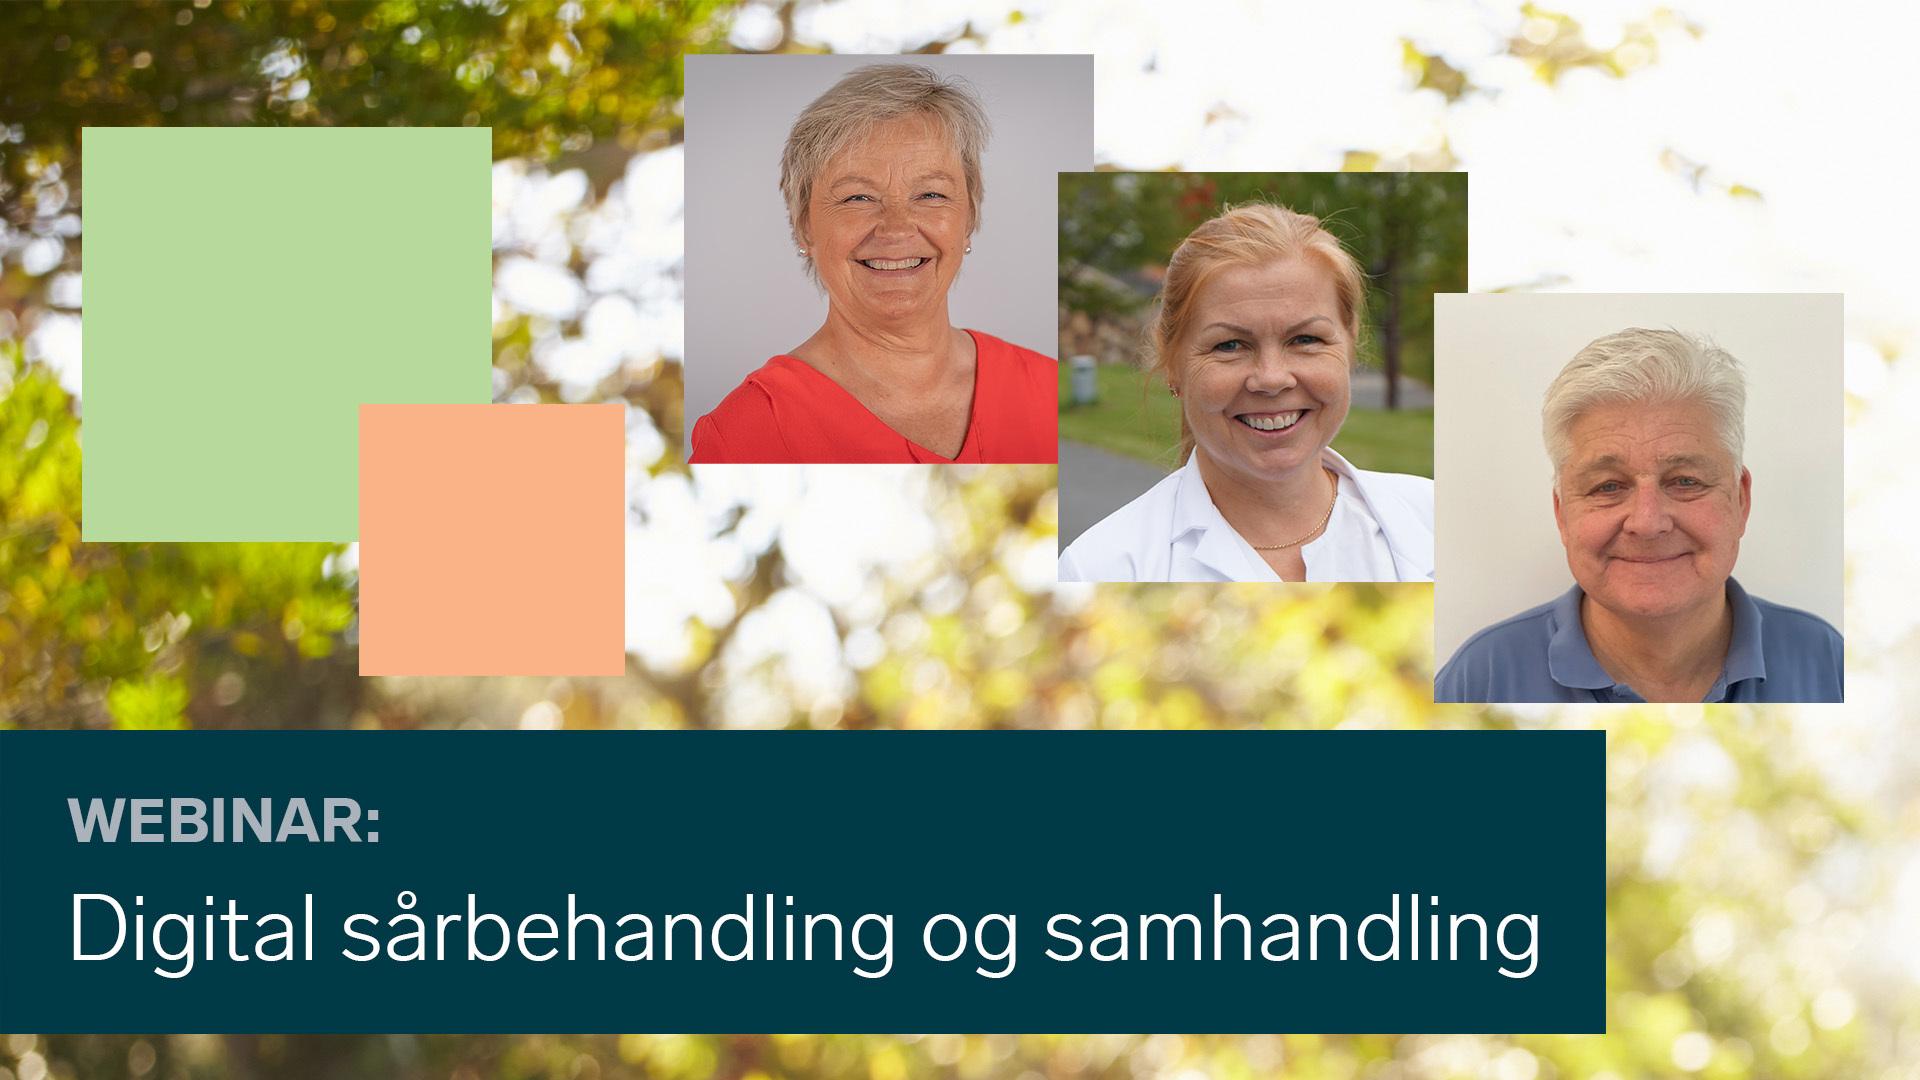 Bodil Bach, Ingebjørg Irgens og Mark Miller delte erfaringer med digital sårbehandling.